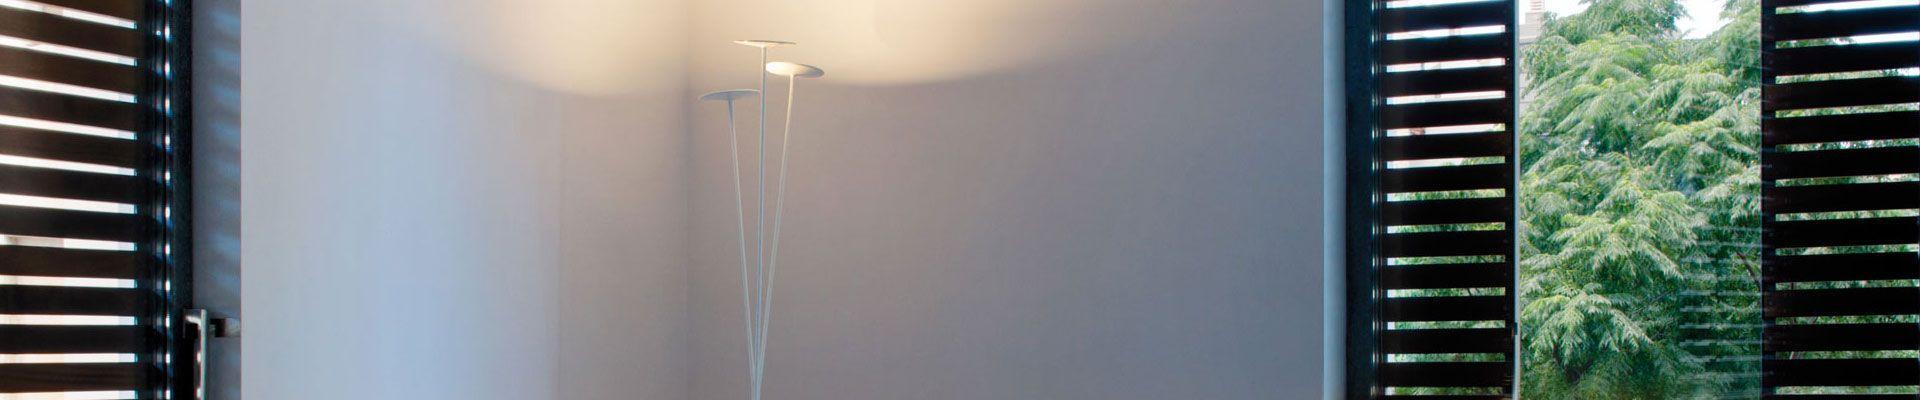 Vibia vloerlampen